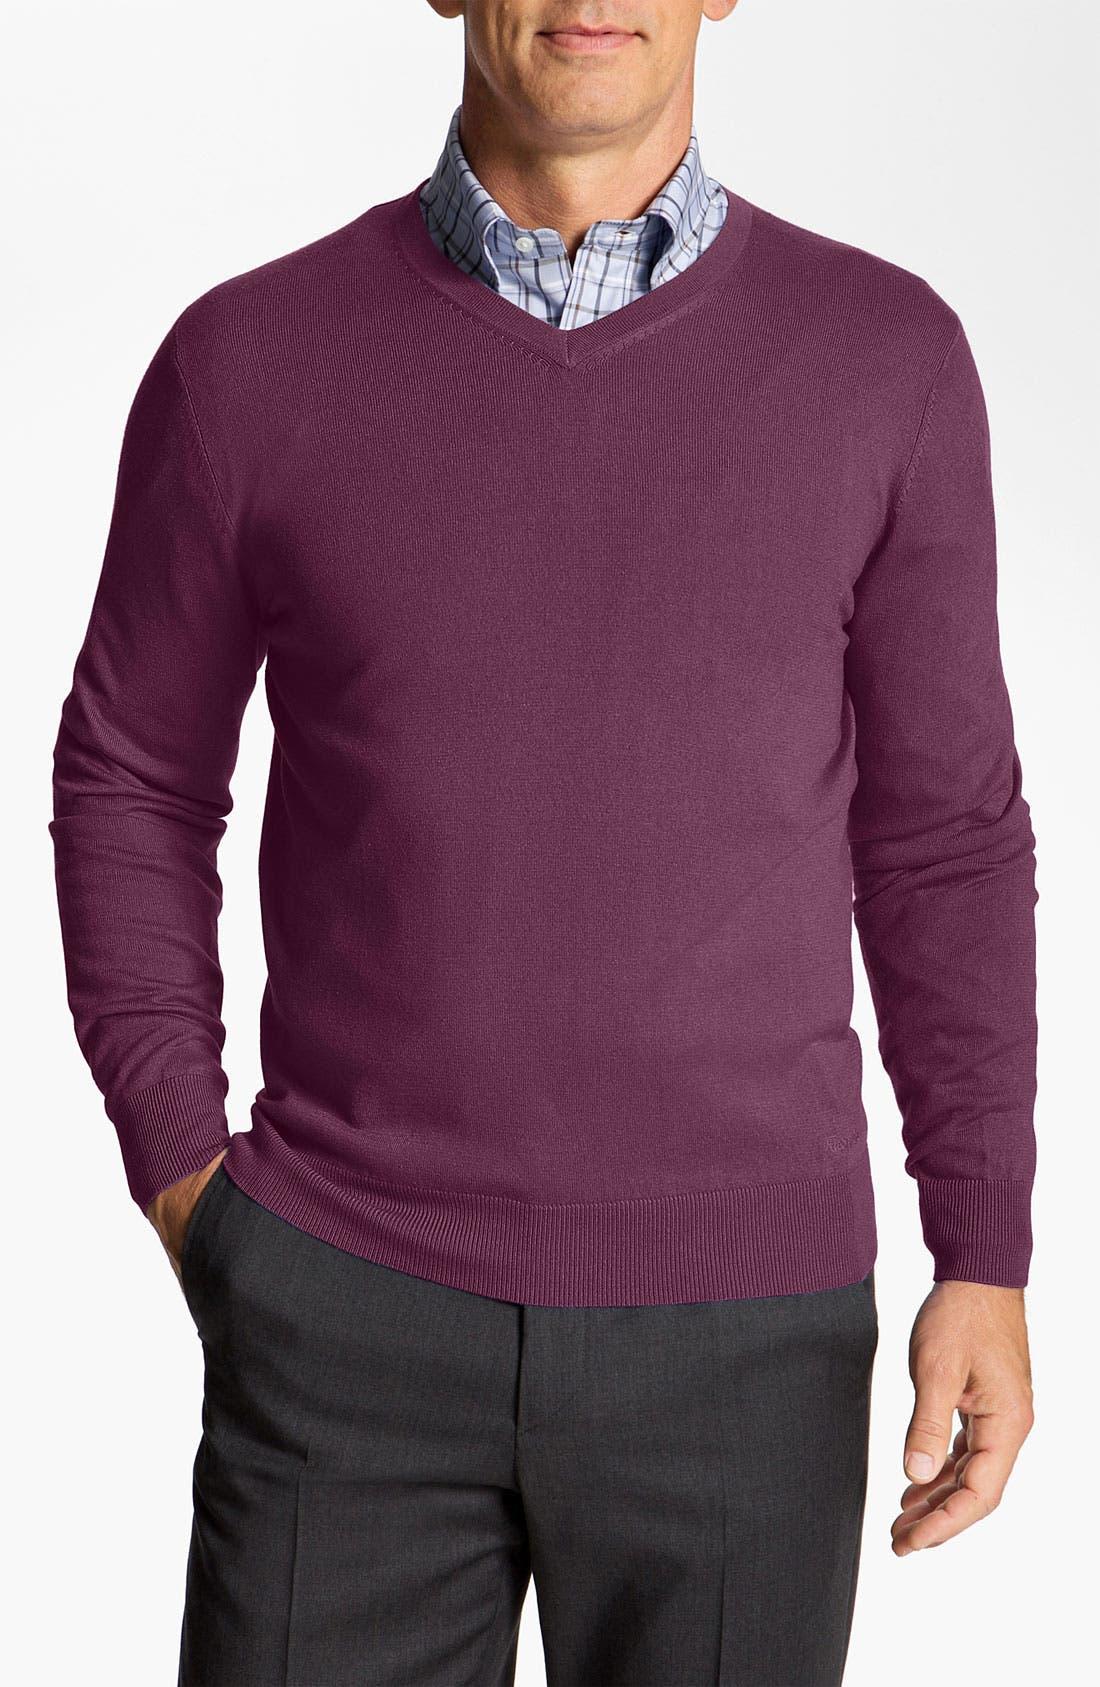 Alternate Image 1 Selected - Façonnable 'Sicoca' Classique Fit Silk Blend Sweater